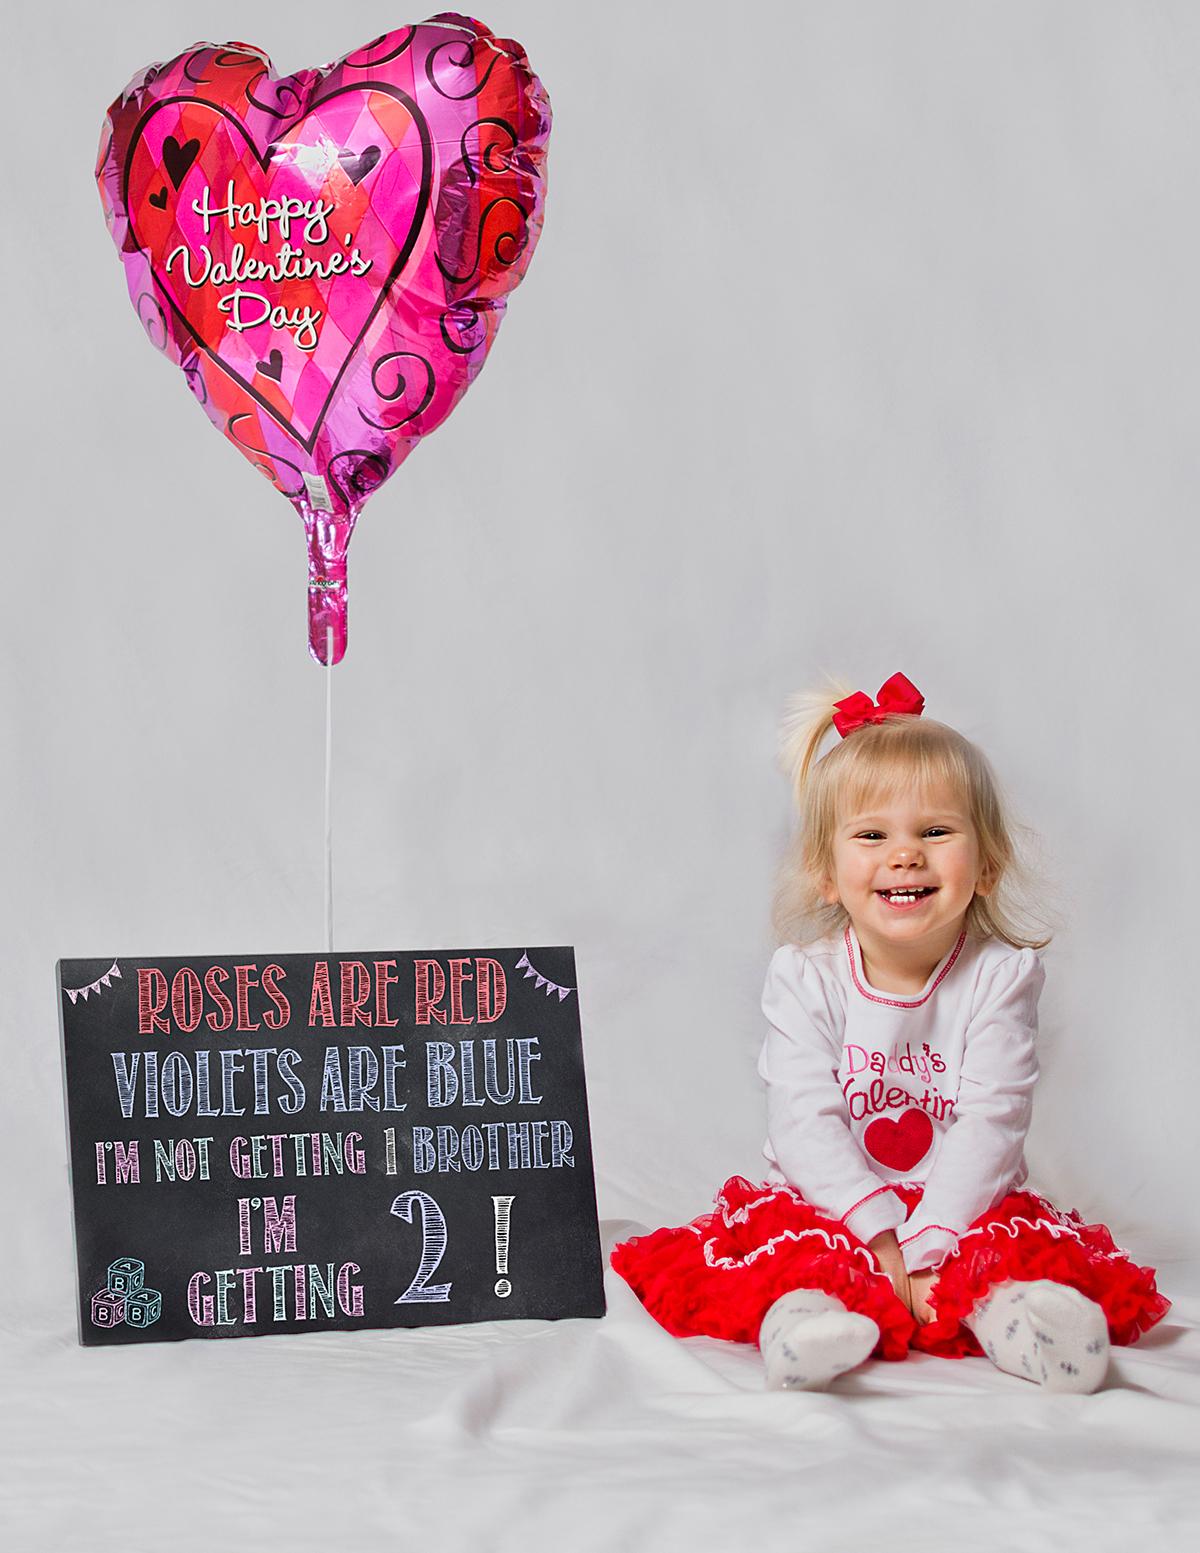 GenderReveal Twins baby Babyannouncement announcement family portraits PortraitPhotography chalk Chalkboard Chalk art chalkboard Art